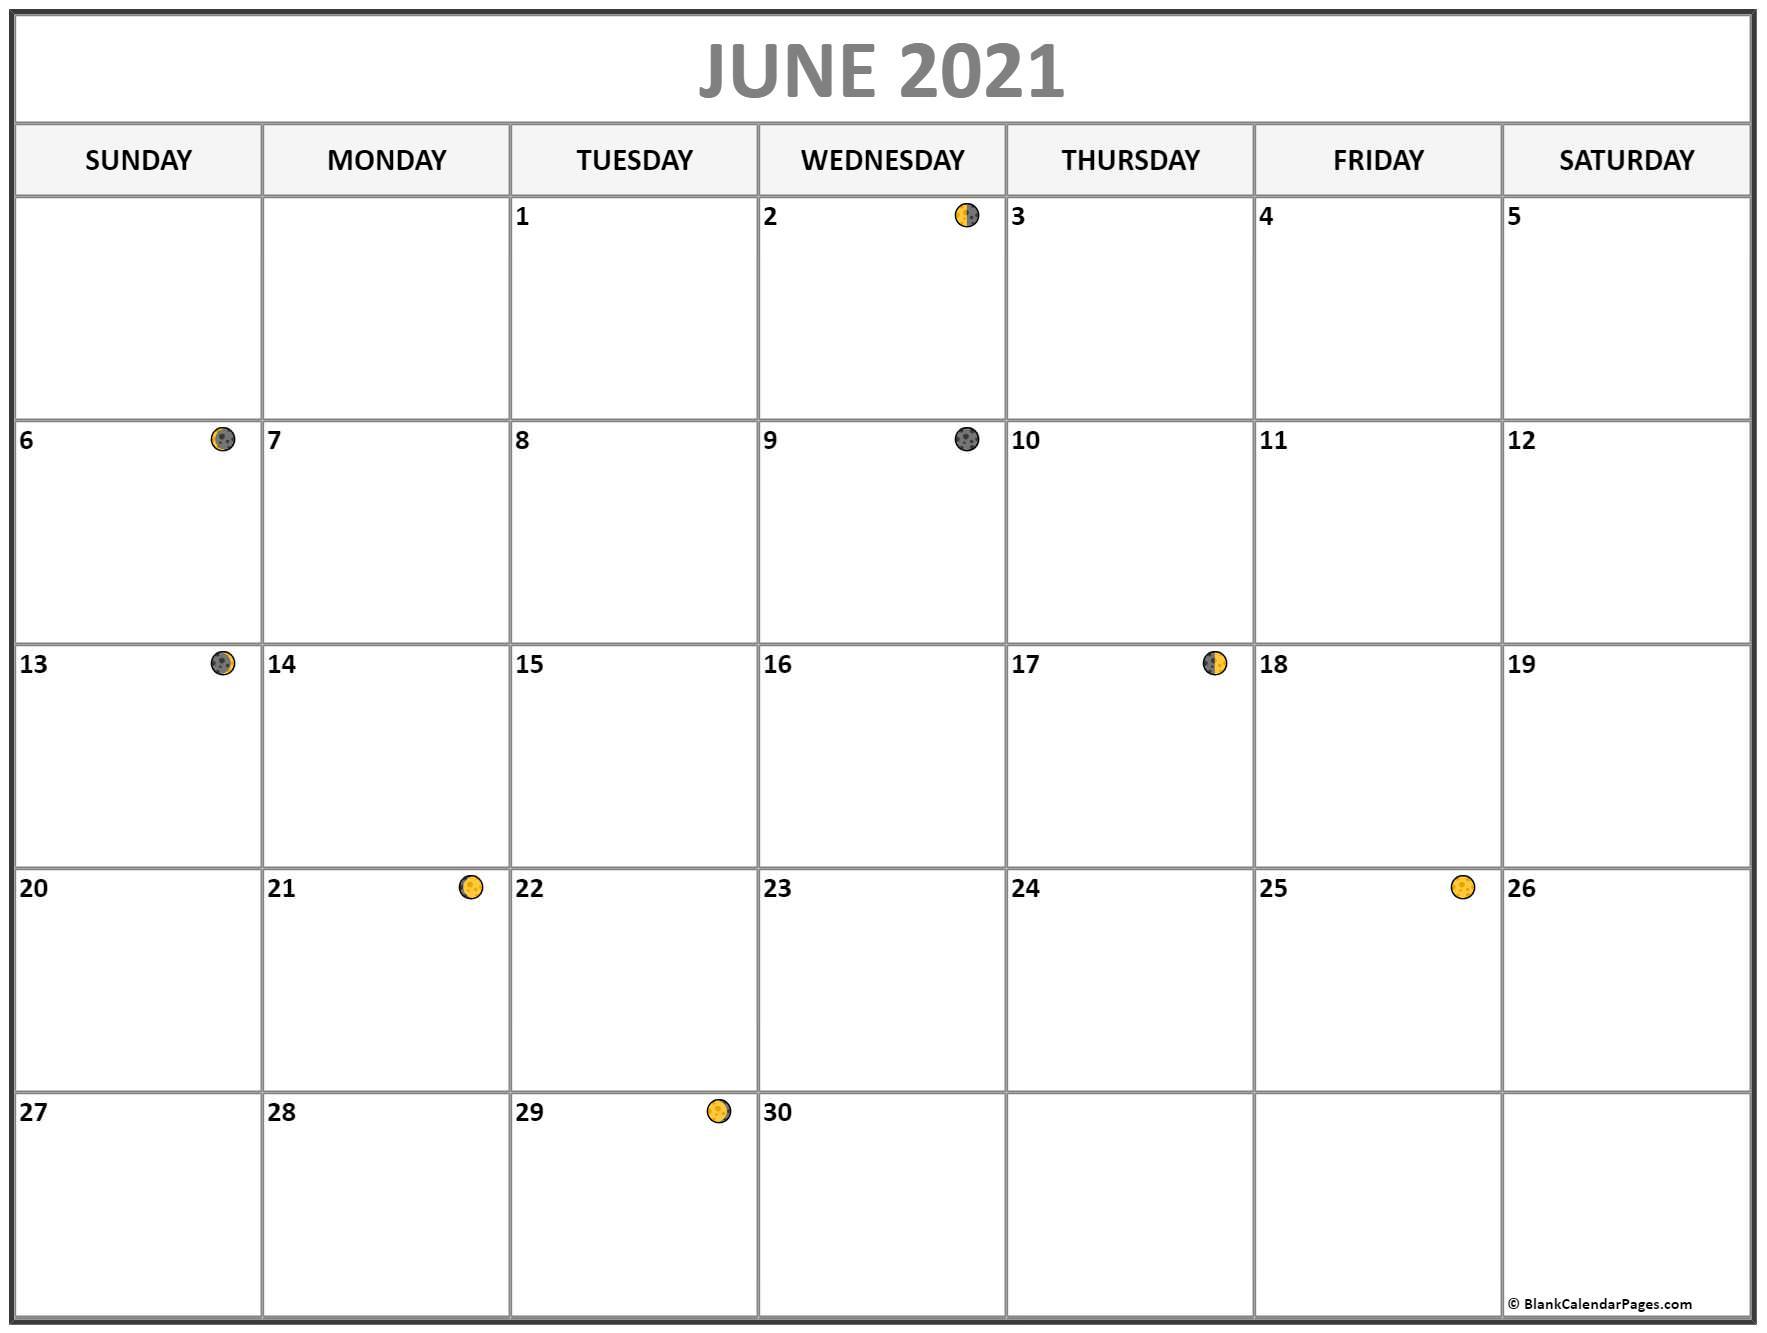 June 2021 Lunar Calendar   Moon Phase Calendar Throughout Moon Calendar 2021 Name And Date For Kids